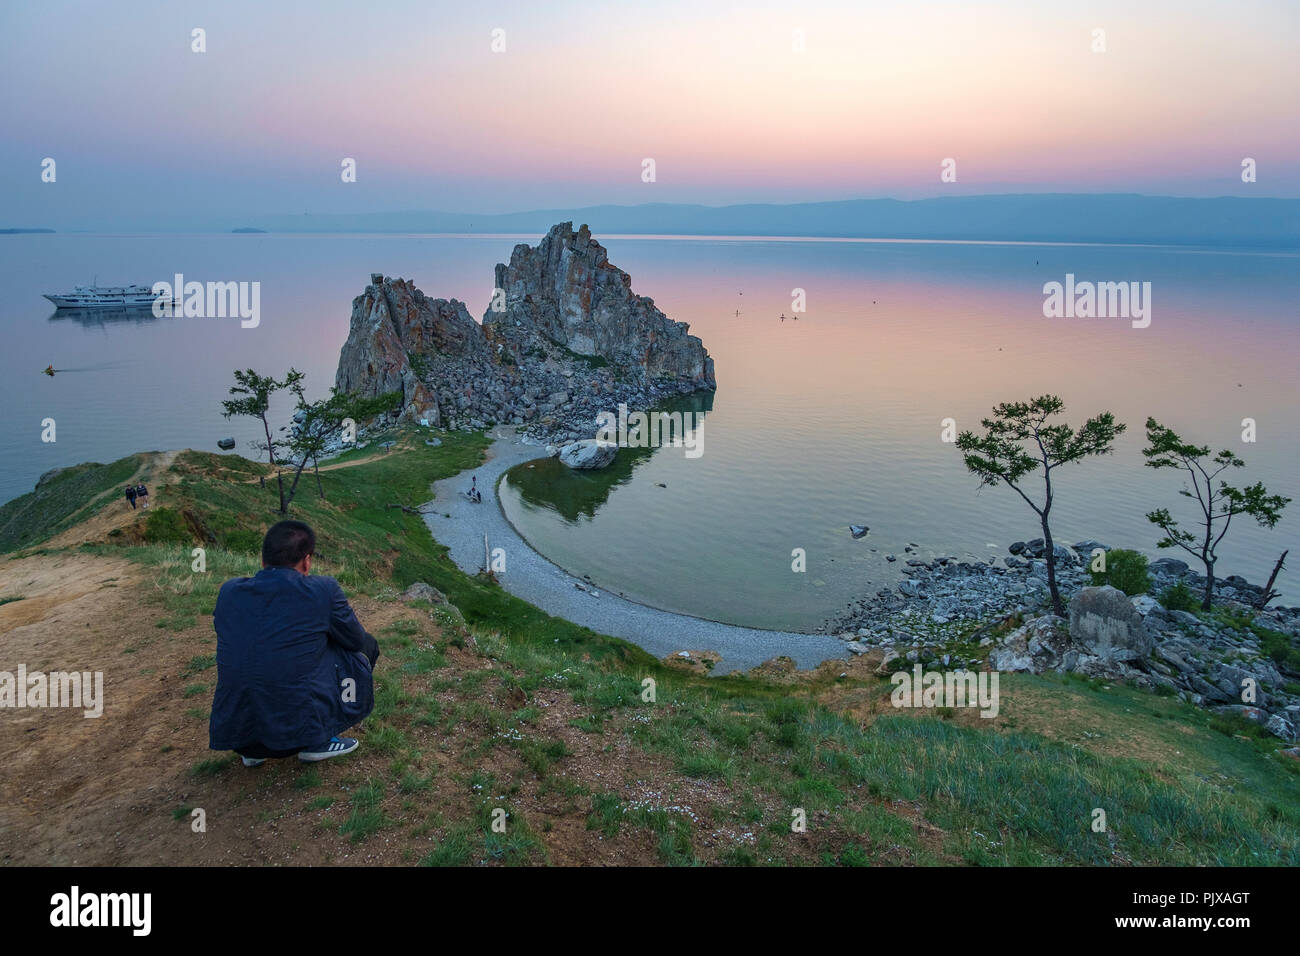 Olkhon Island, Baikal lake, Russia - Stock Image